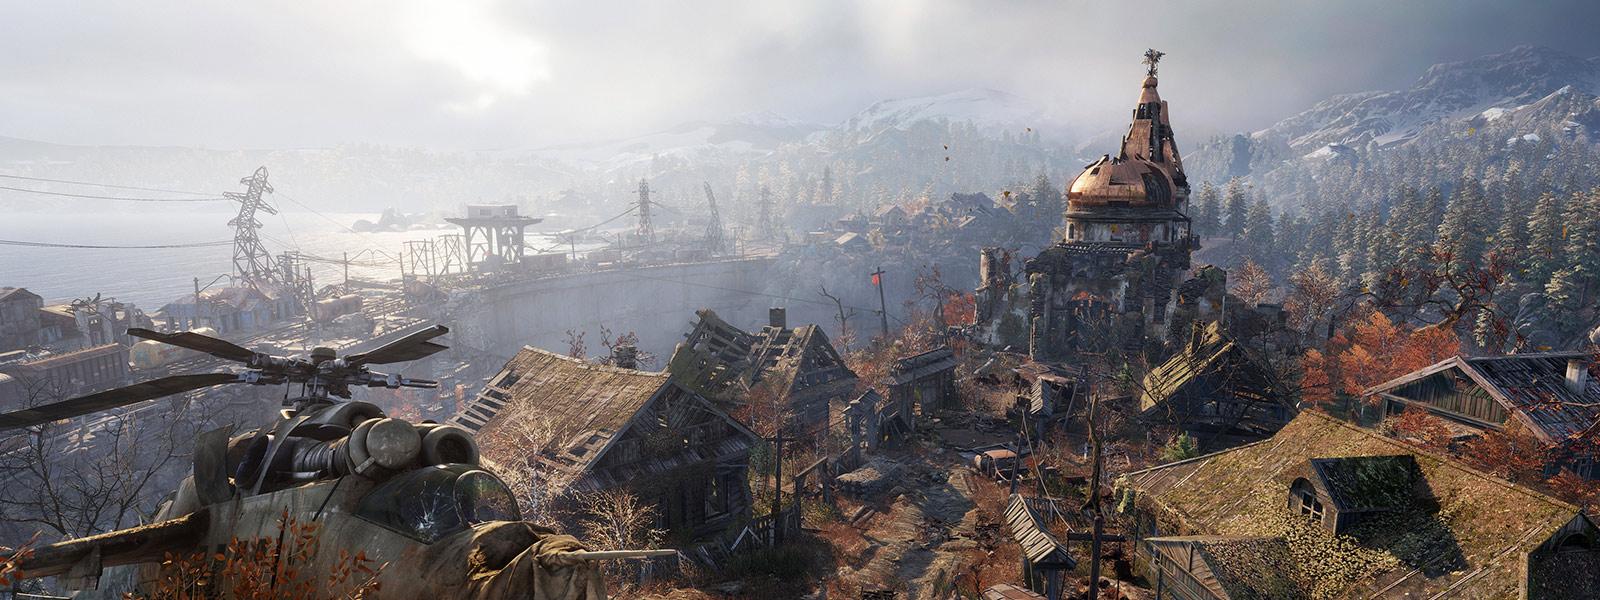 desolate town